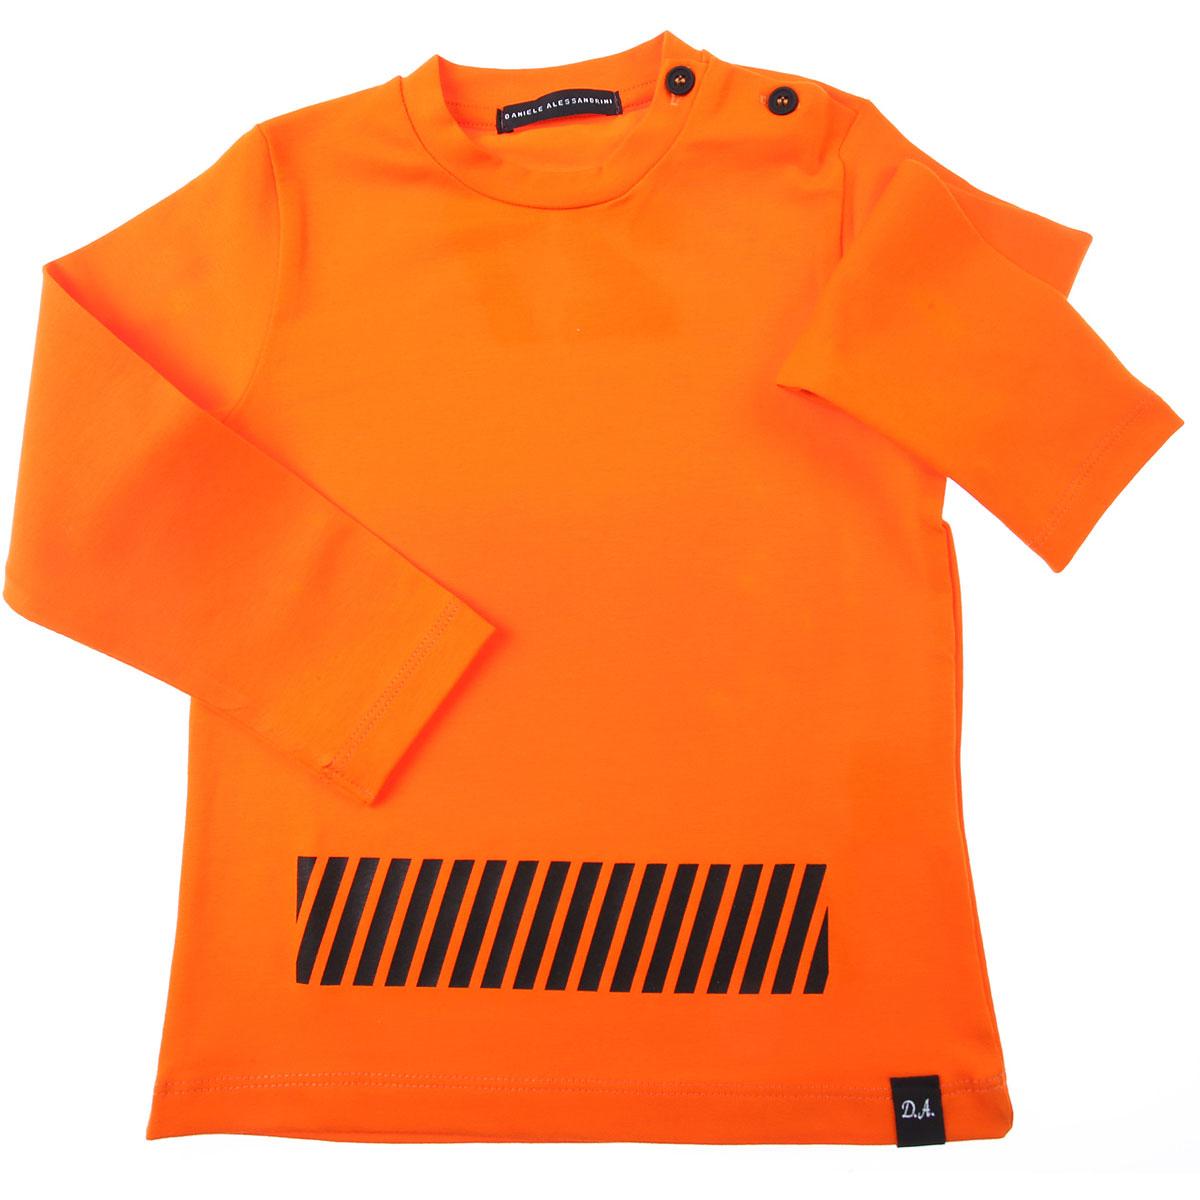 Daniele Alessandrini Baby T-Shirt for Boys On Sale, Bright Orange, Cotton, 2019, 12 M 18M 4Y 9M